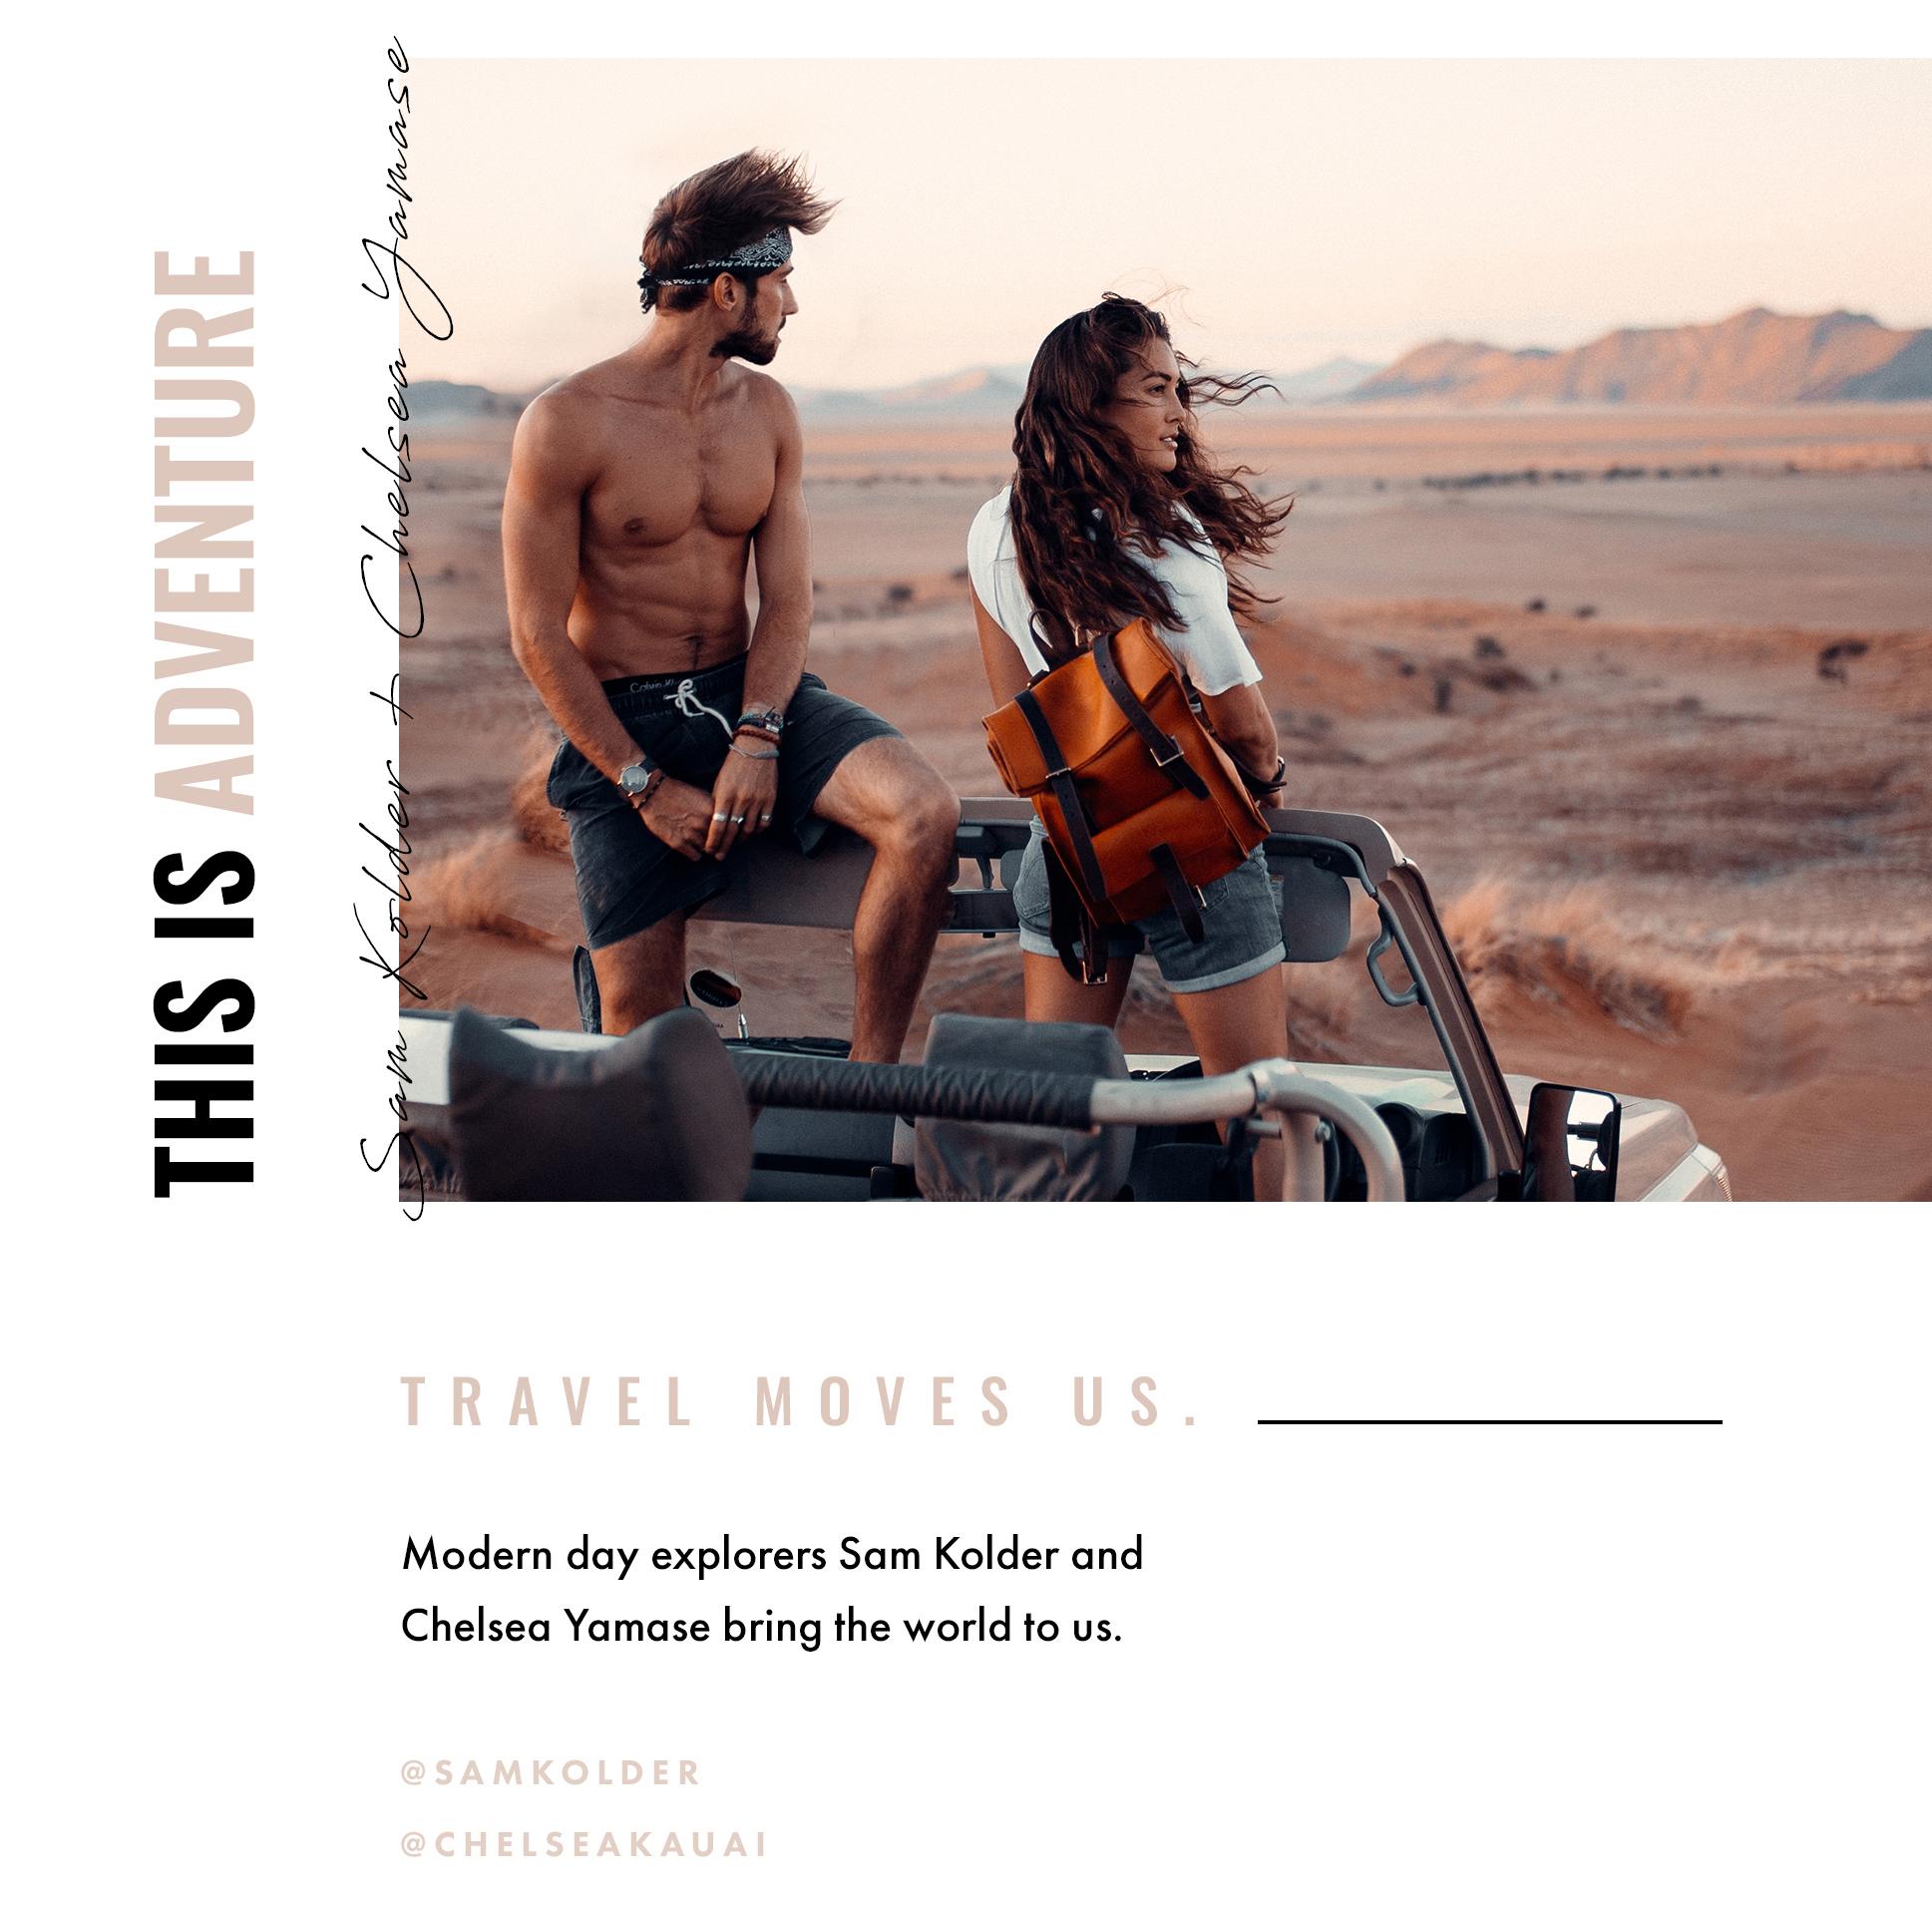 This is Adventure. Sam Kolder + Chelsea Yamase. Travel moves us. Modern day explorers Sam Kolder and Chelsea Yamase bring the world to us. @samkolder @chelseakauai